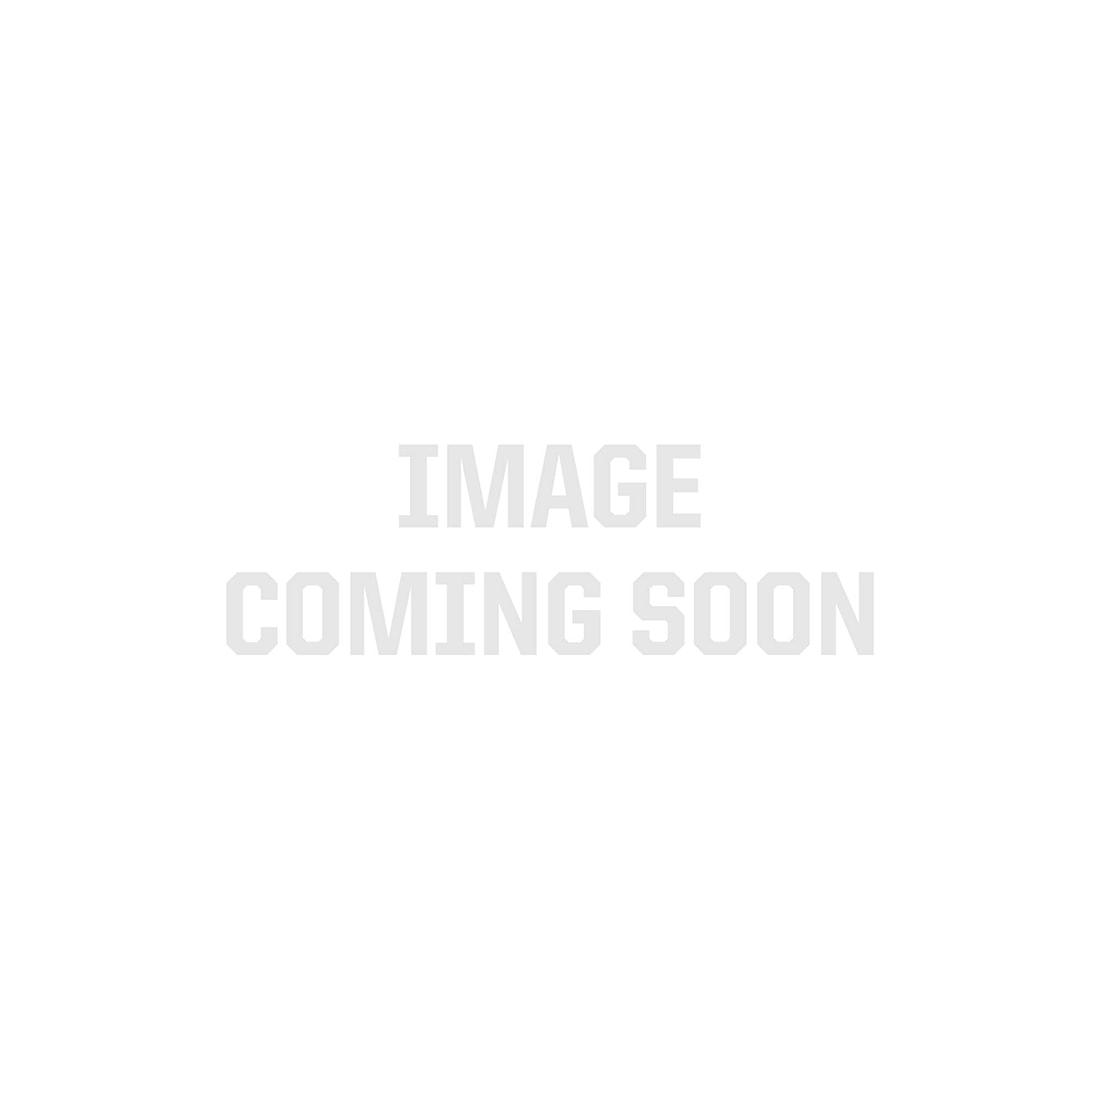 Green 3528 Quad Row LED Strip Light, 450/m, 28mm wide, Sample Kit